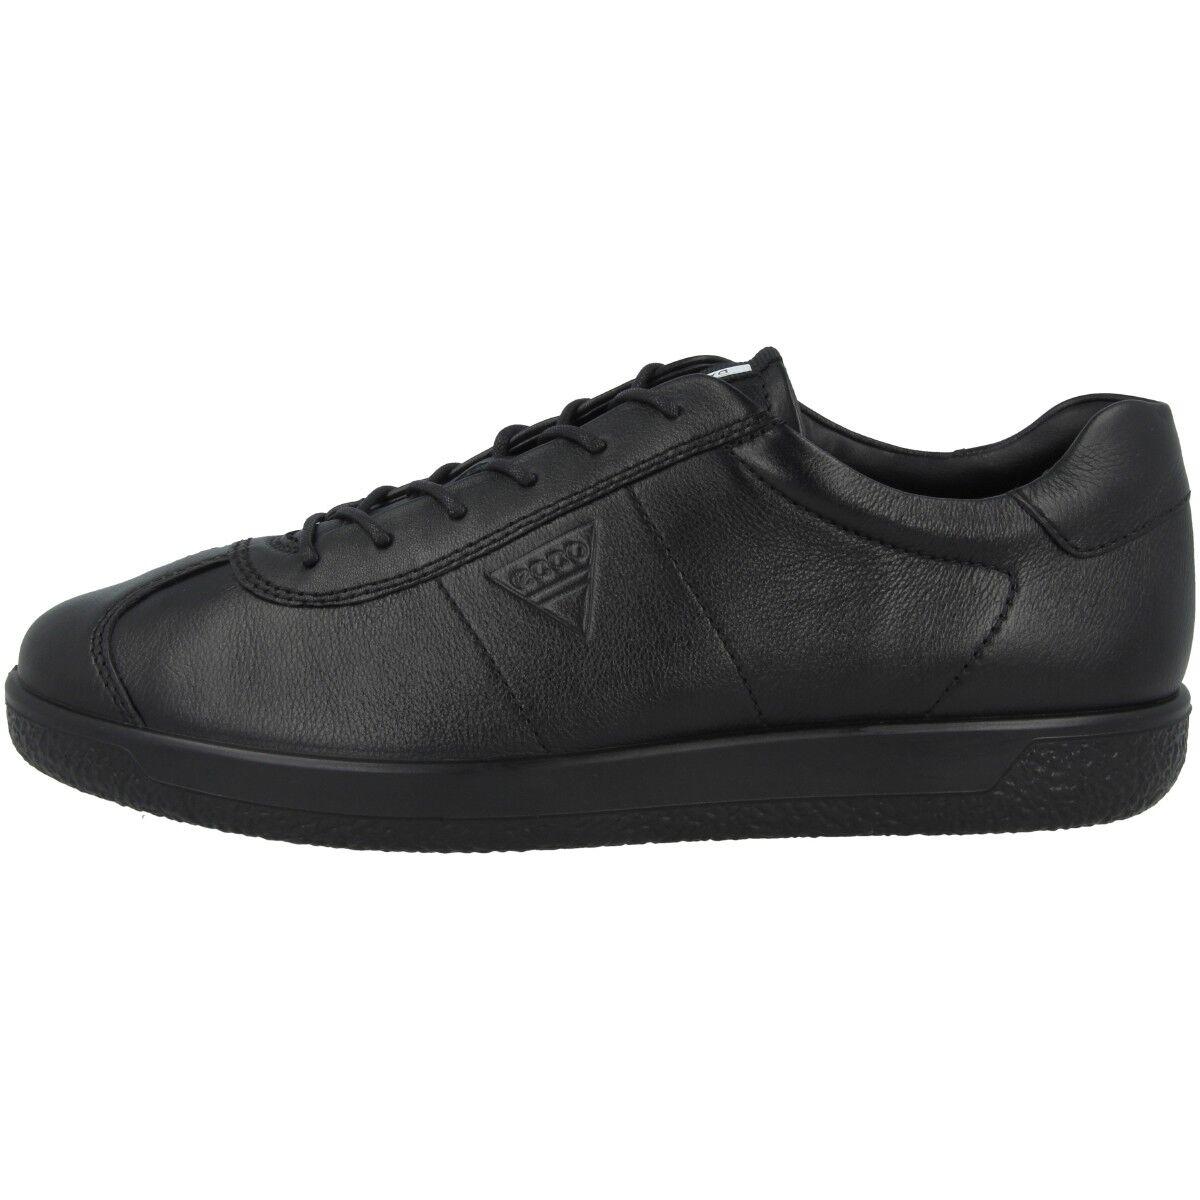 Ecco Soft Sneaker 1 Men Schuhe Herren Sneaker Soft Leder Halbschuhe